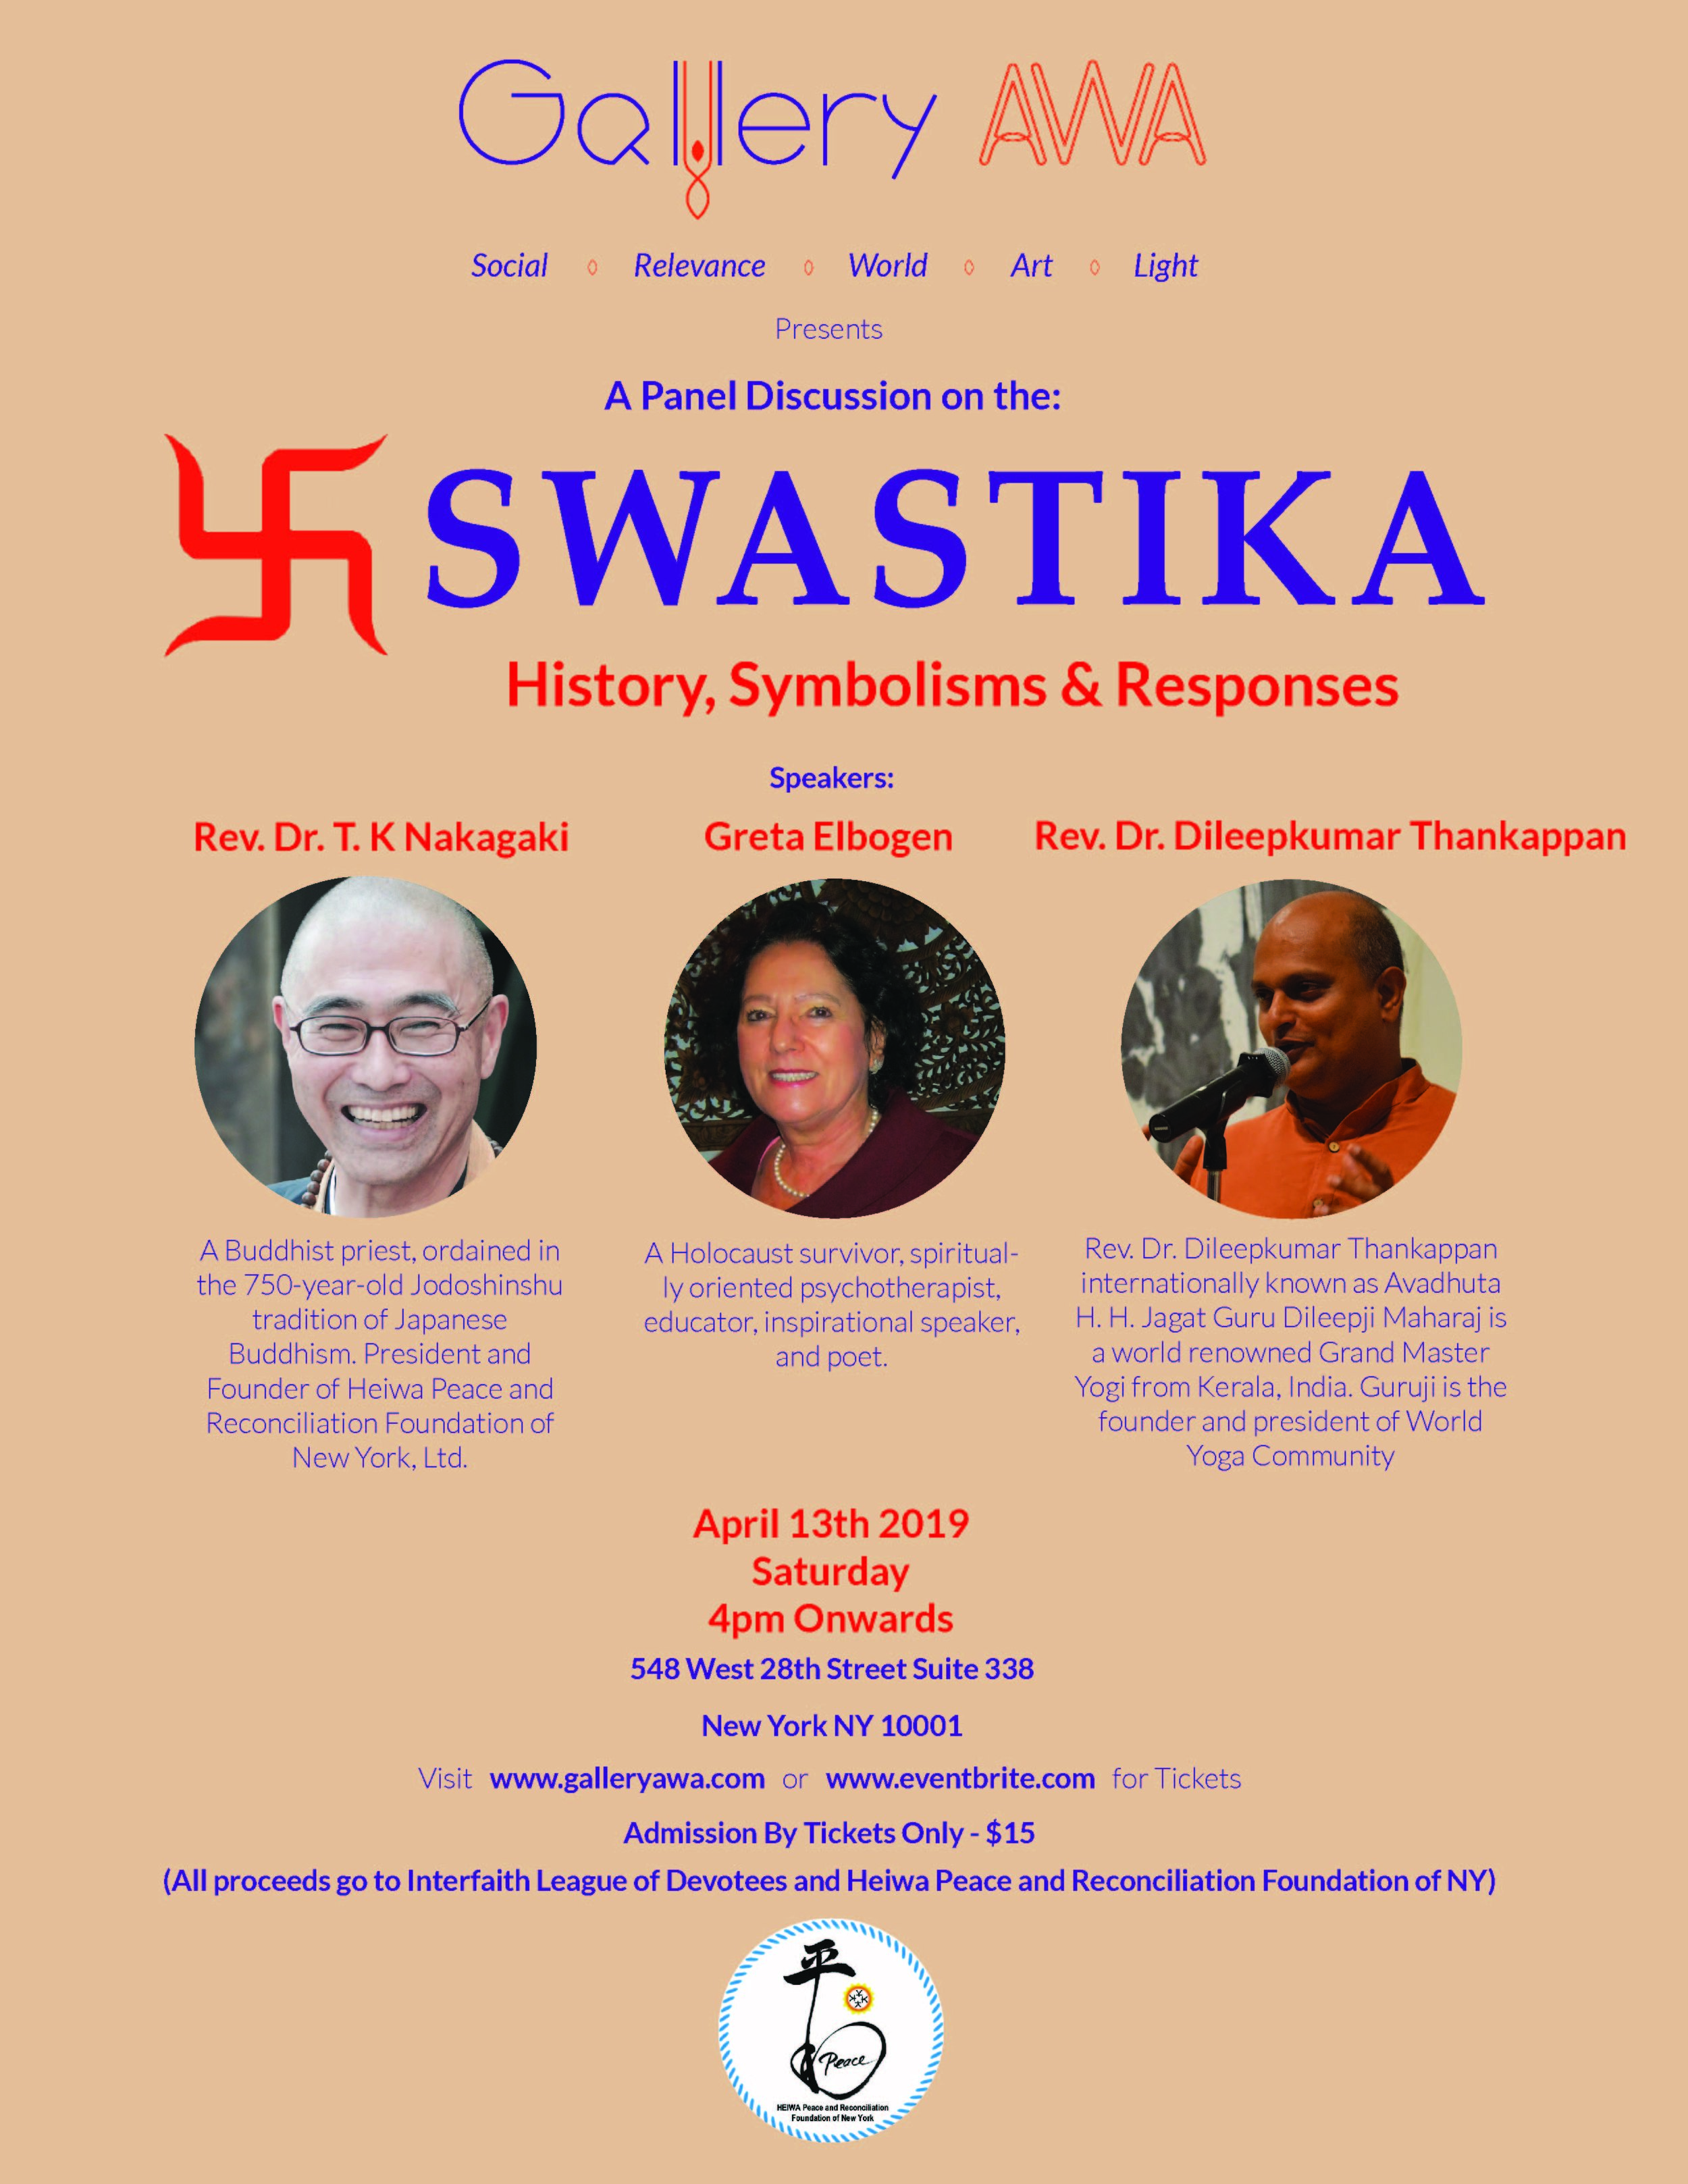 GalleryAWA-Swastika HSR-Poster-11APR19_1.jpg